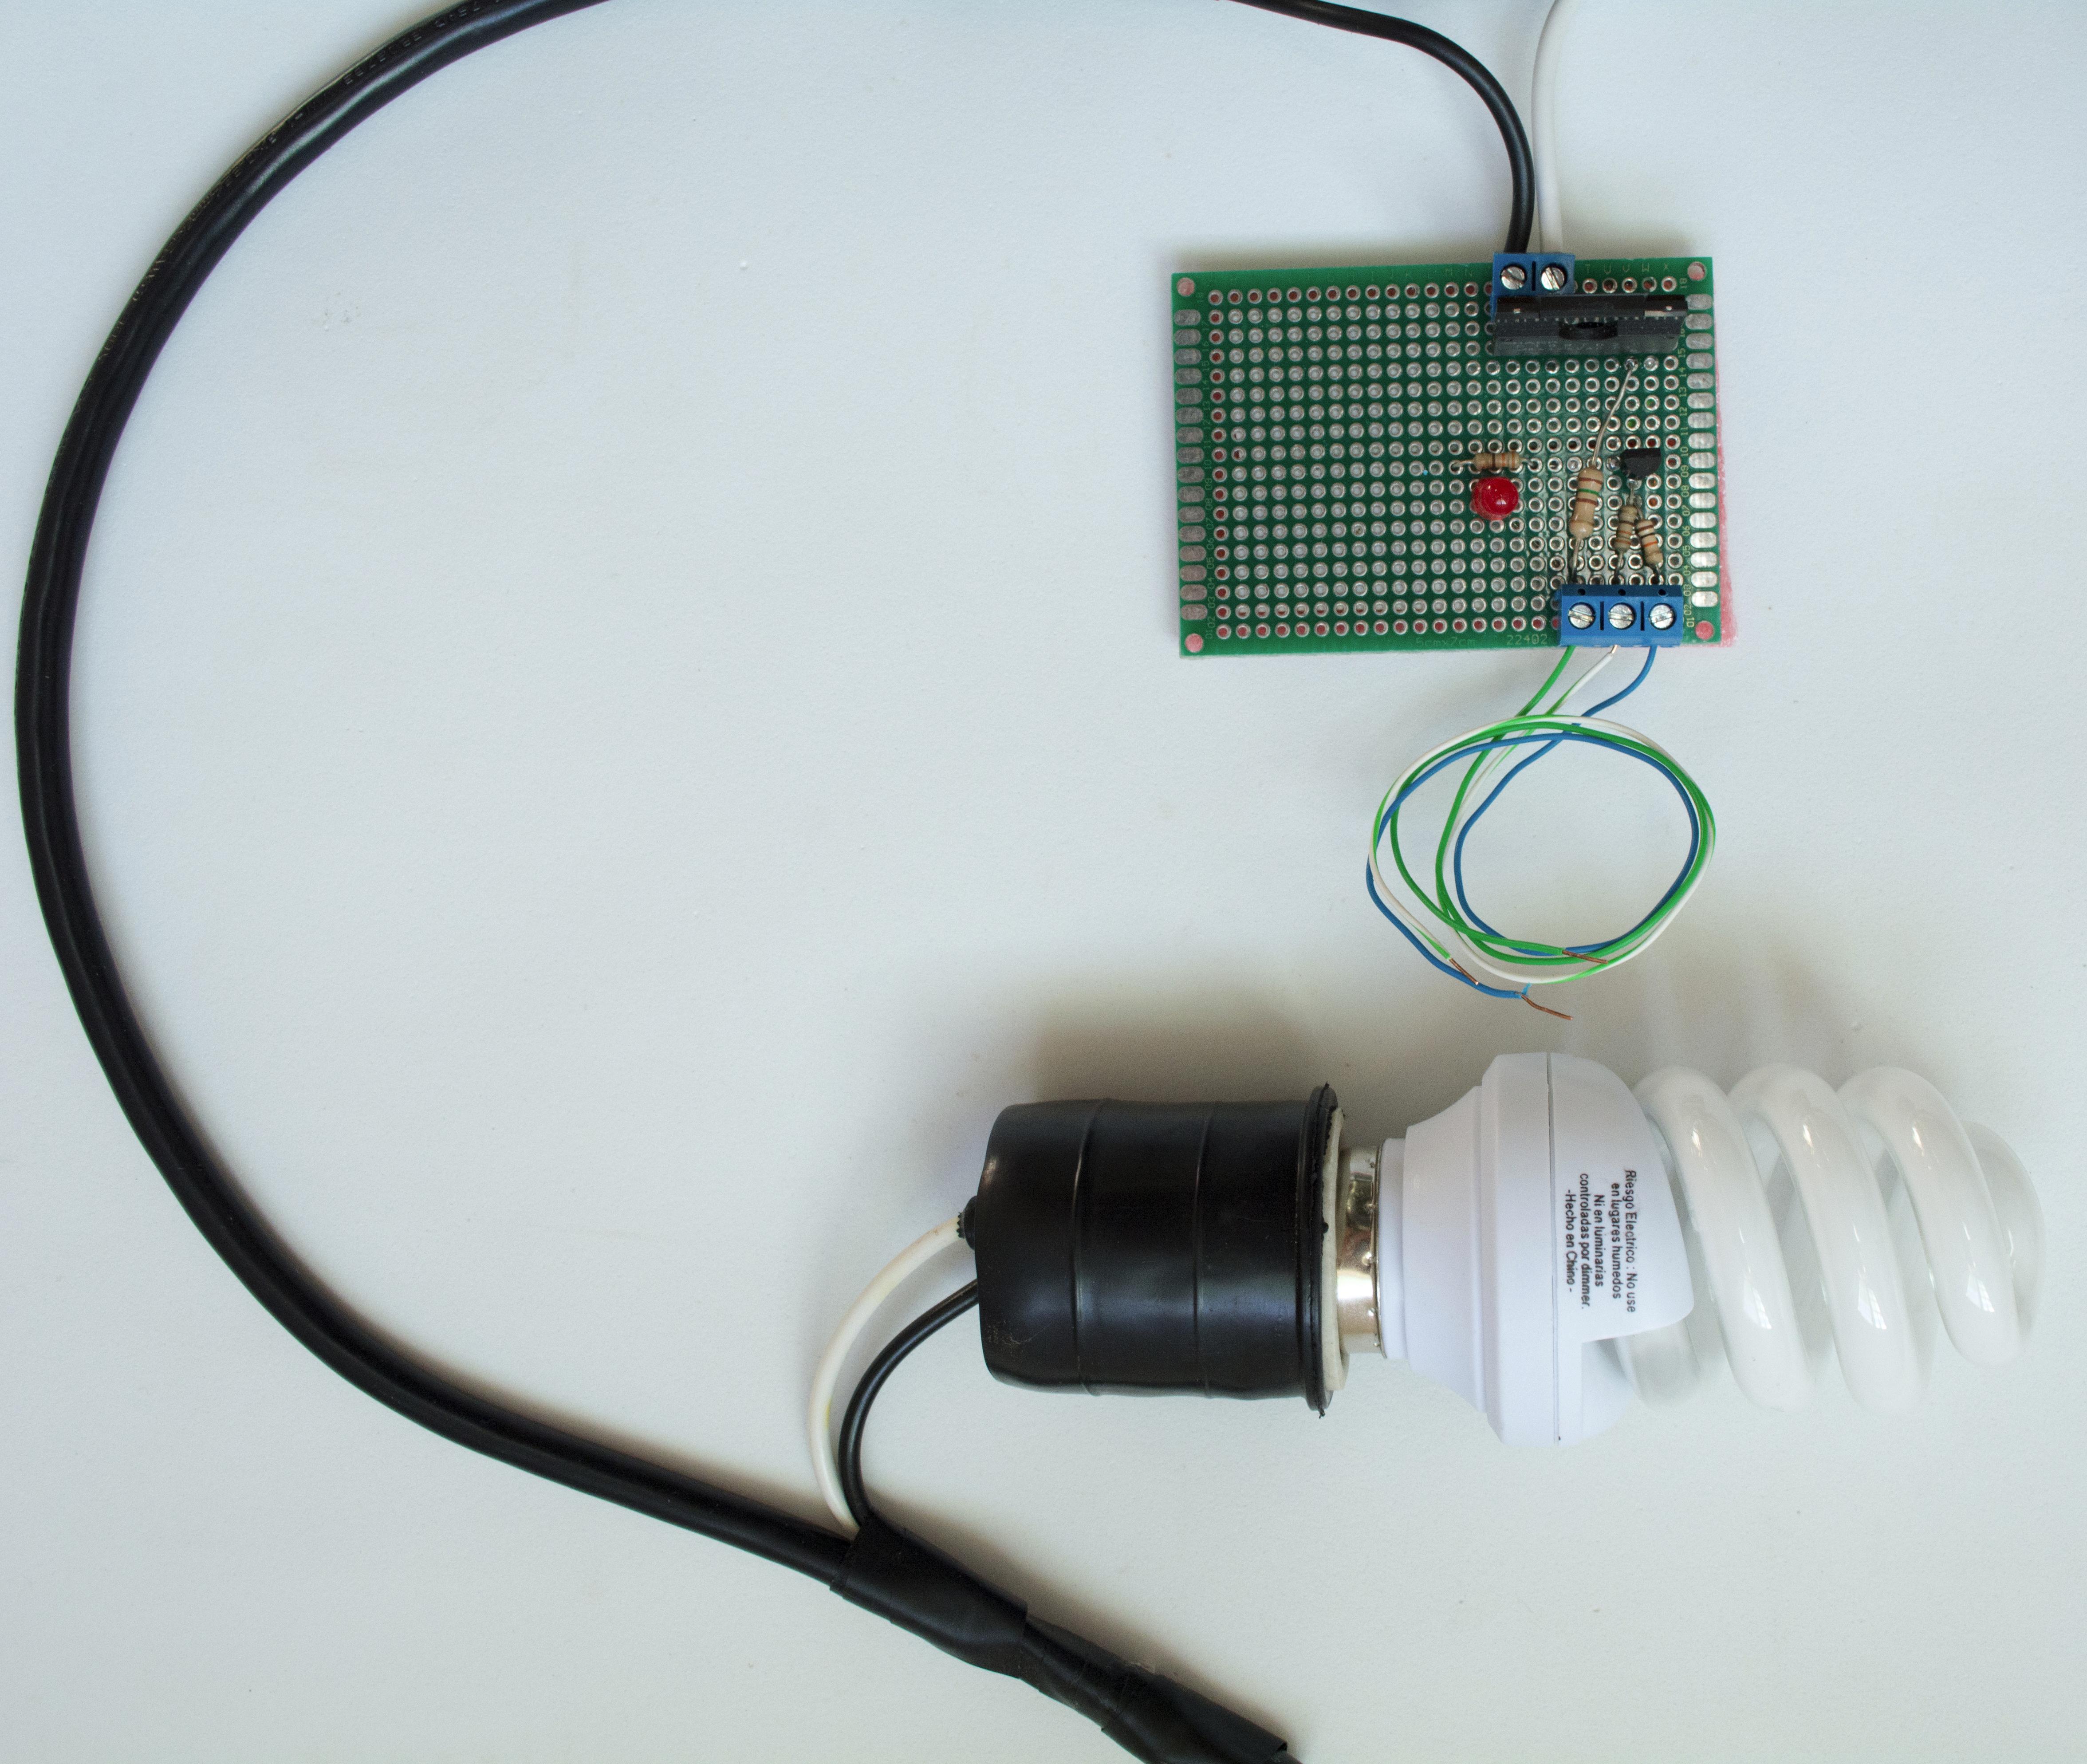 Emergency Phone Call Alert To An Arduino Via Asterisk Pbx Ip Wiring Diagram S108t02 Relay Circuit